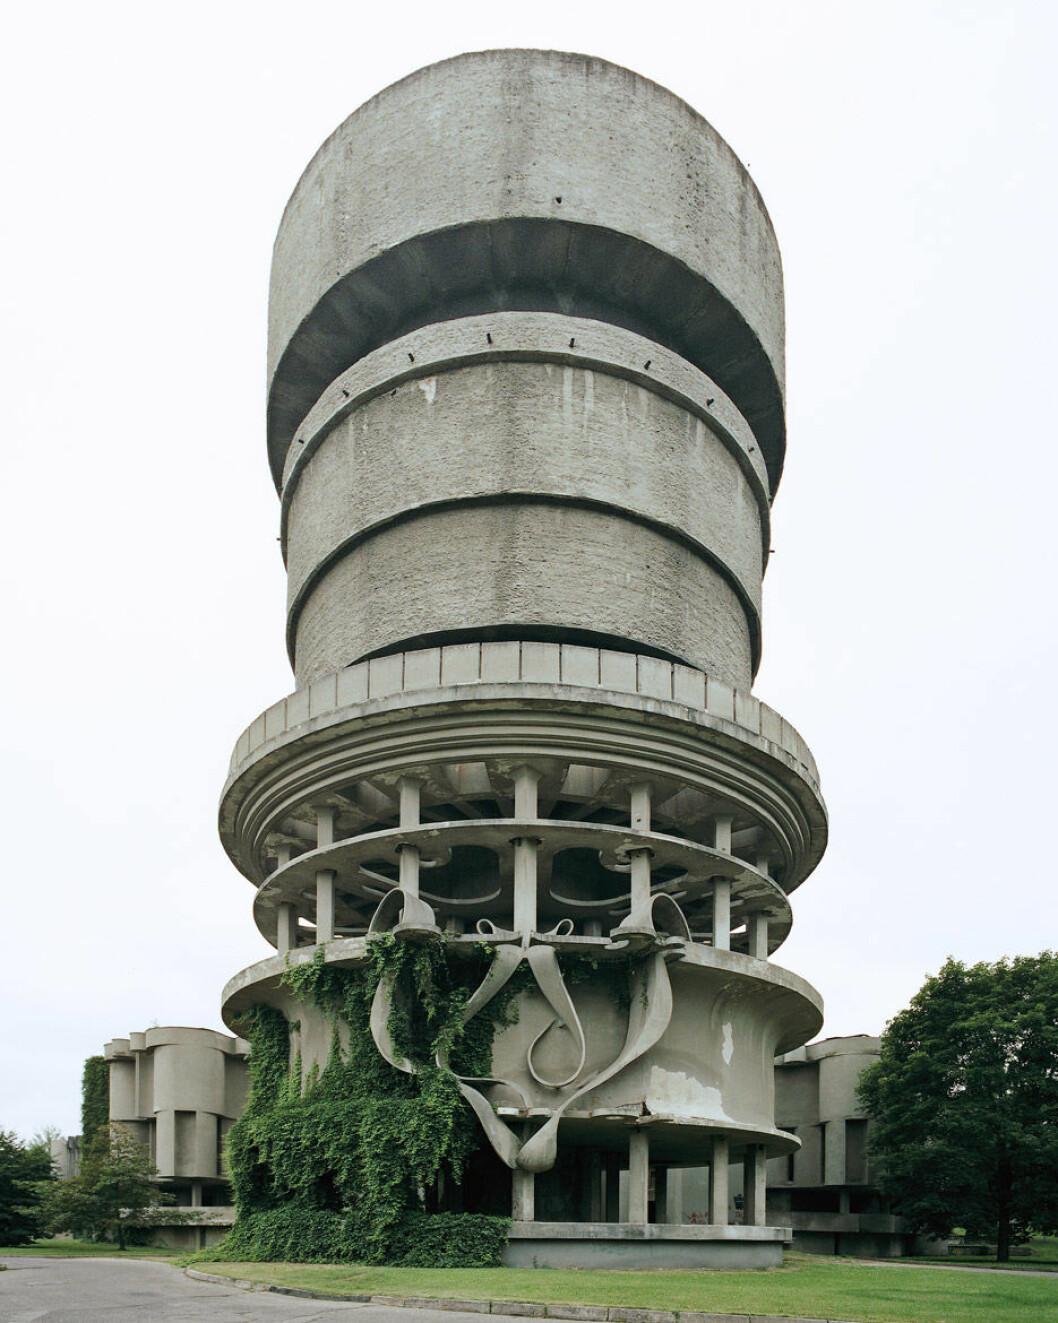 modern-forms-photo-essay-nicolas-grospierre_dezeen_936_10